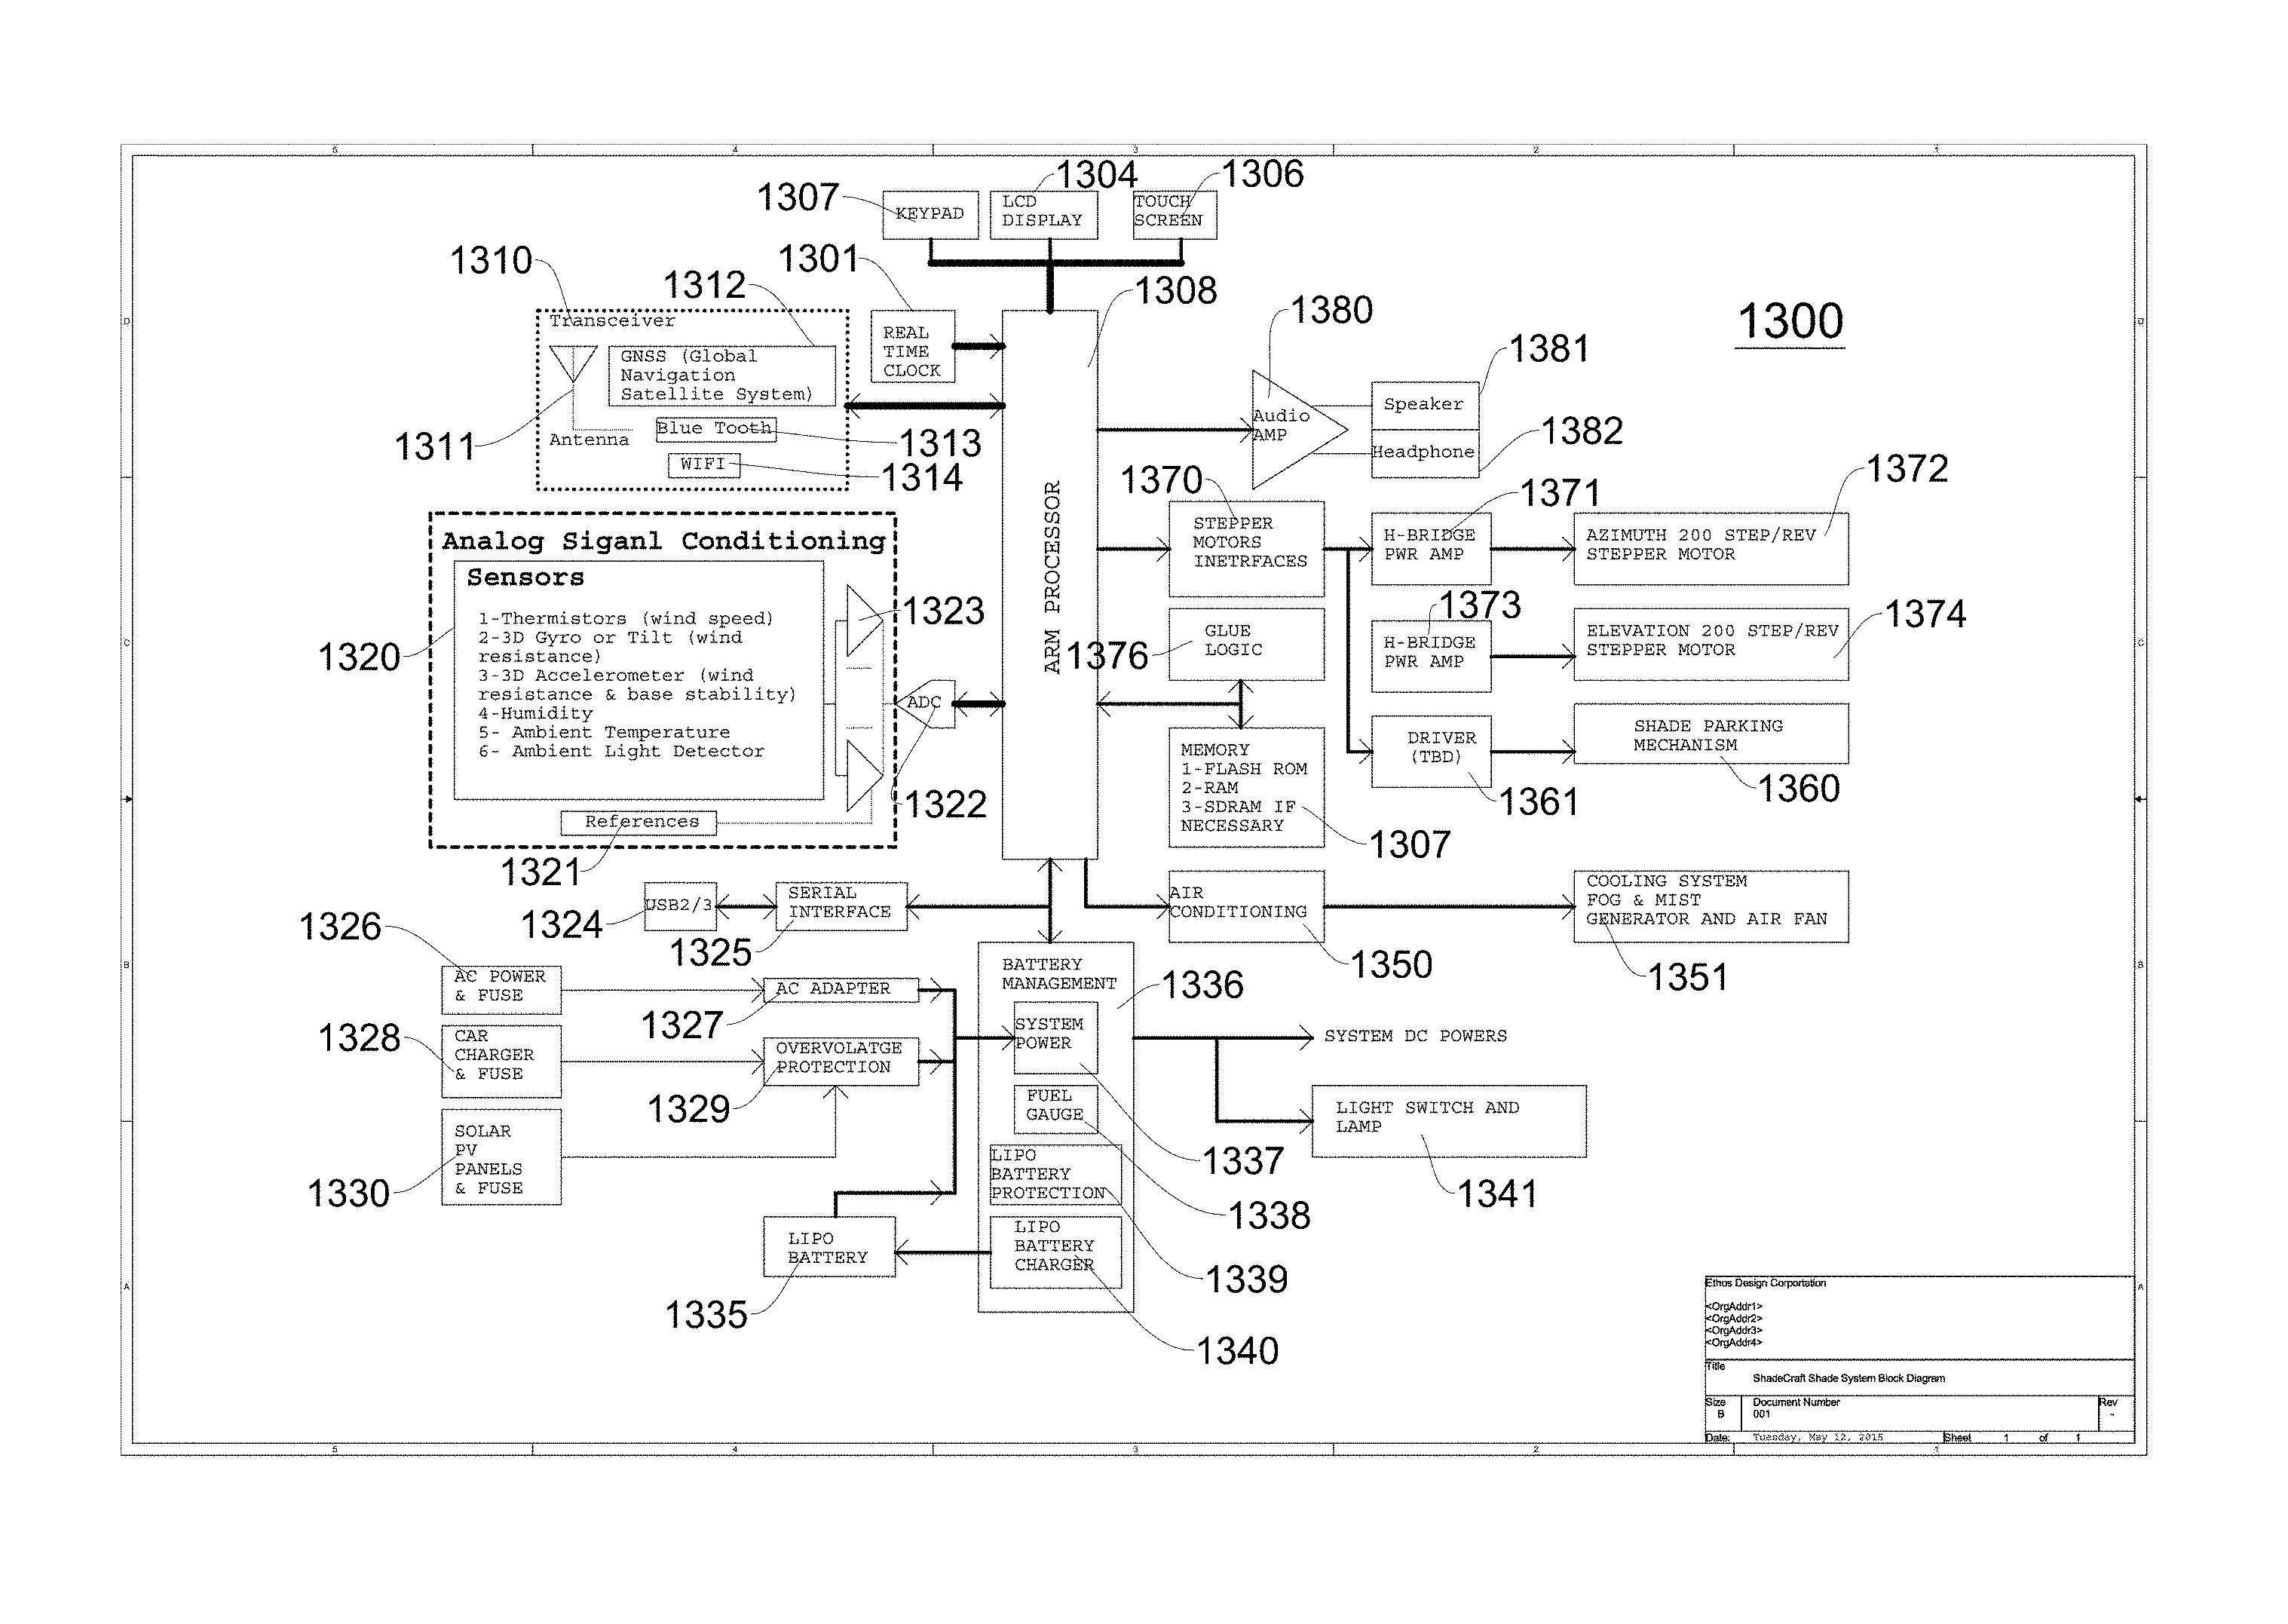 Patent US 10,078,856 B2